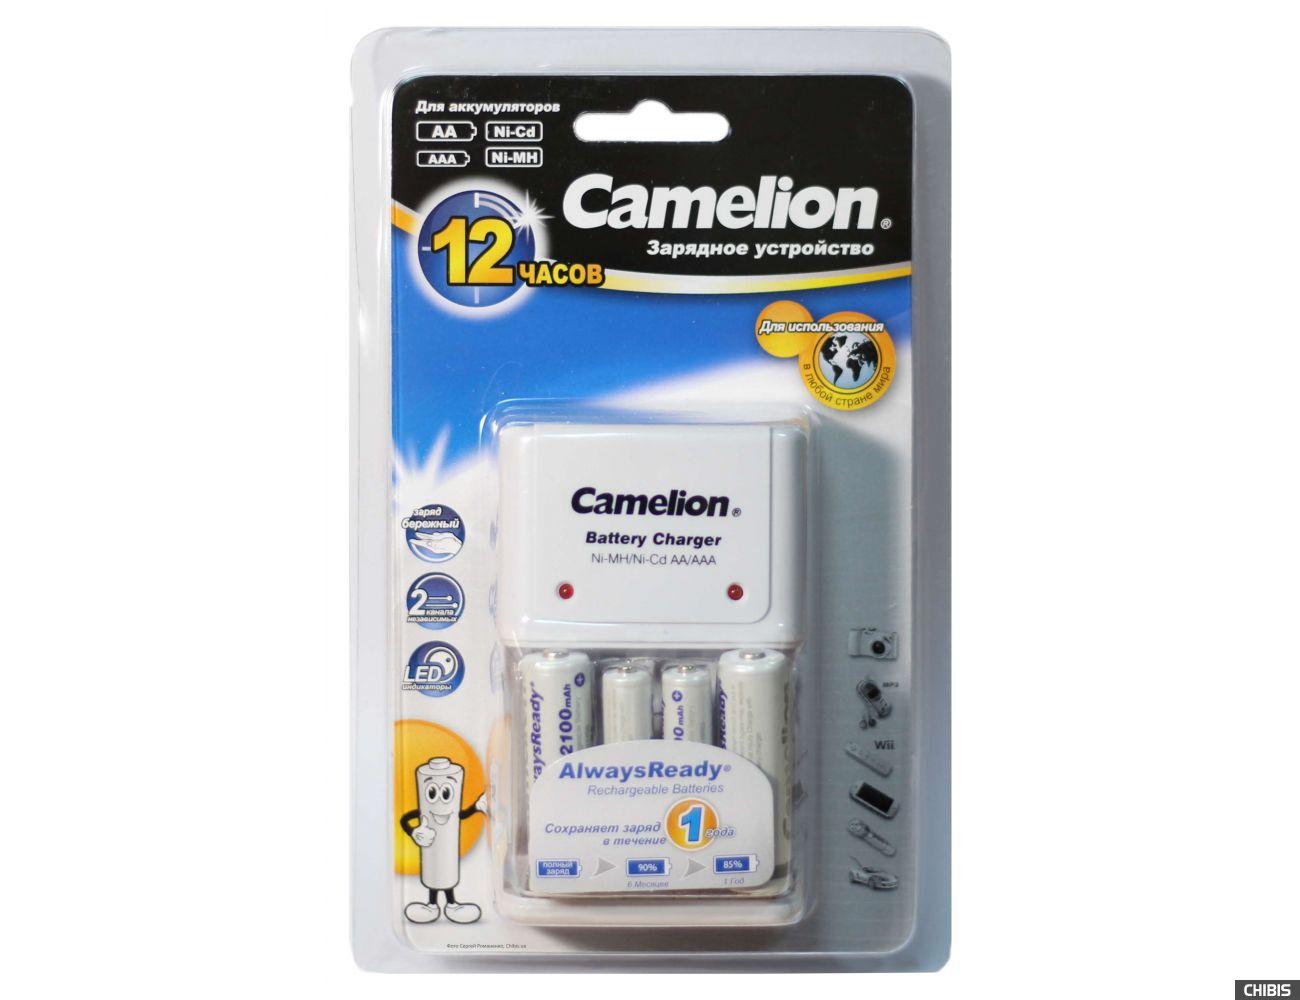 Зарядное устройство АА ААА Camelion BC-1010 + 2 AA 2100 / 2 AAA 800 mAh